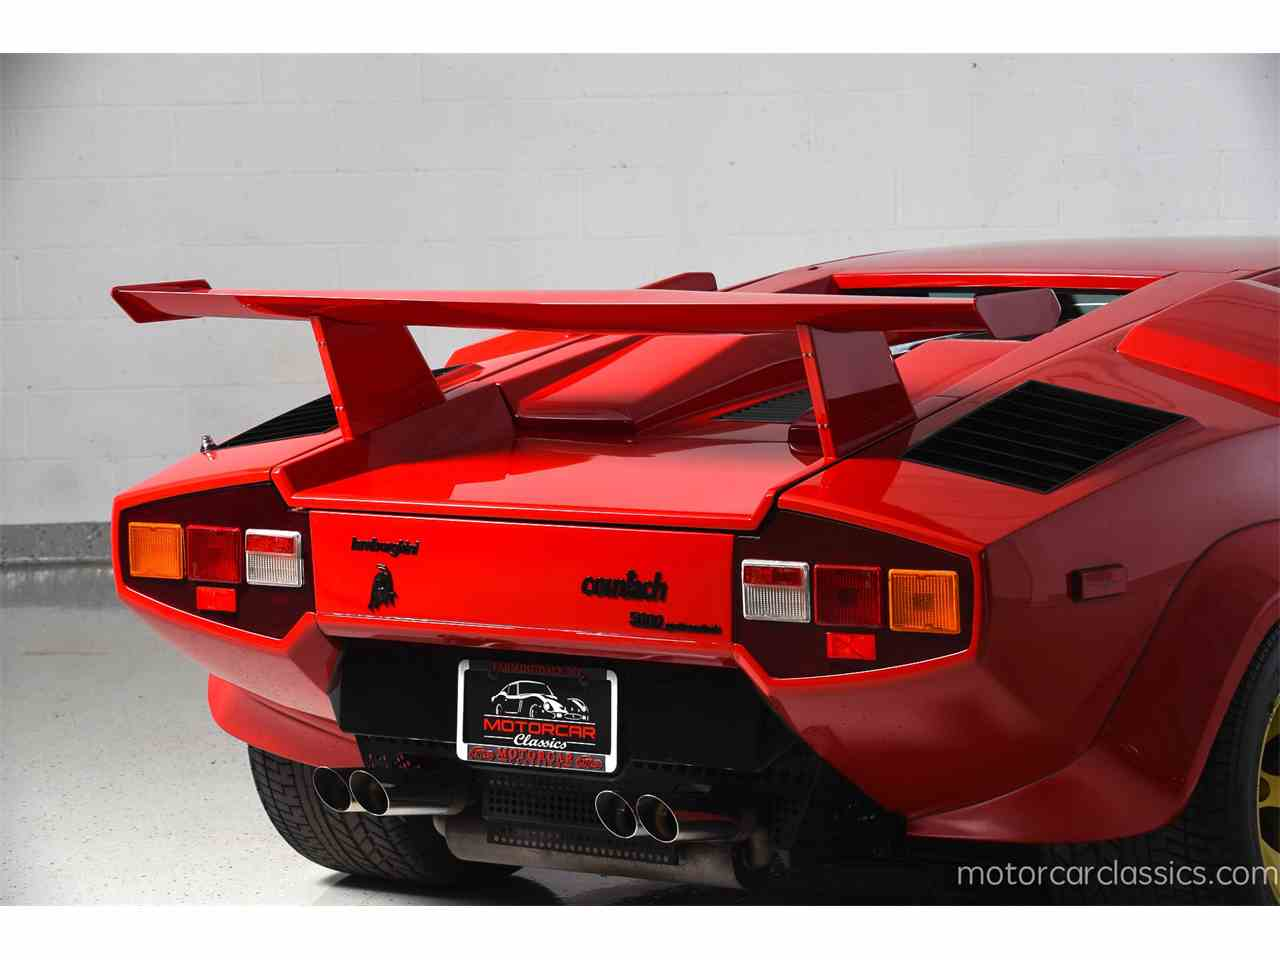 1987 Lamborghini Countach For Sale Classiccars Com Cc